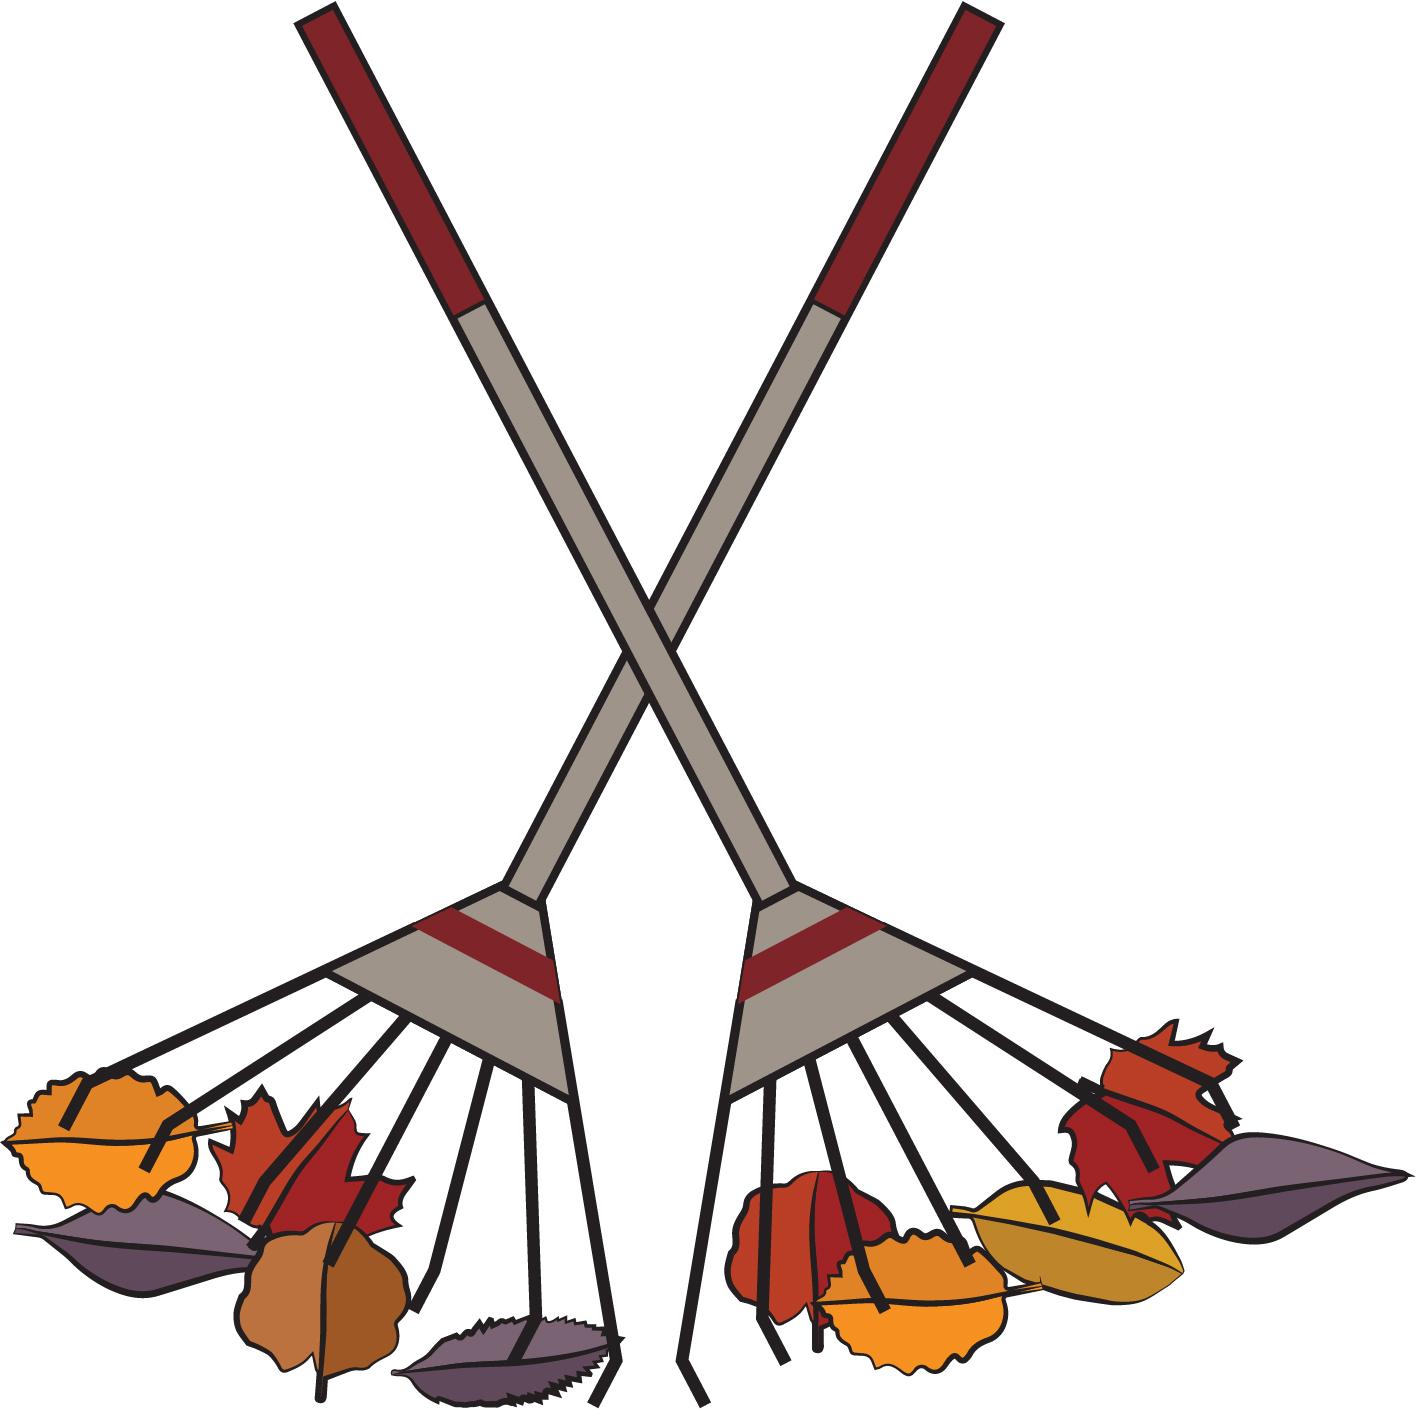 hight resolution of 1416x1409 raking leaves clipart yard rakes clipart autumn clipart fall